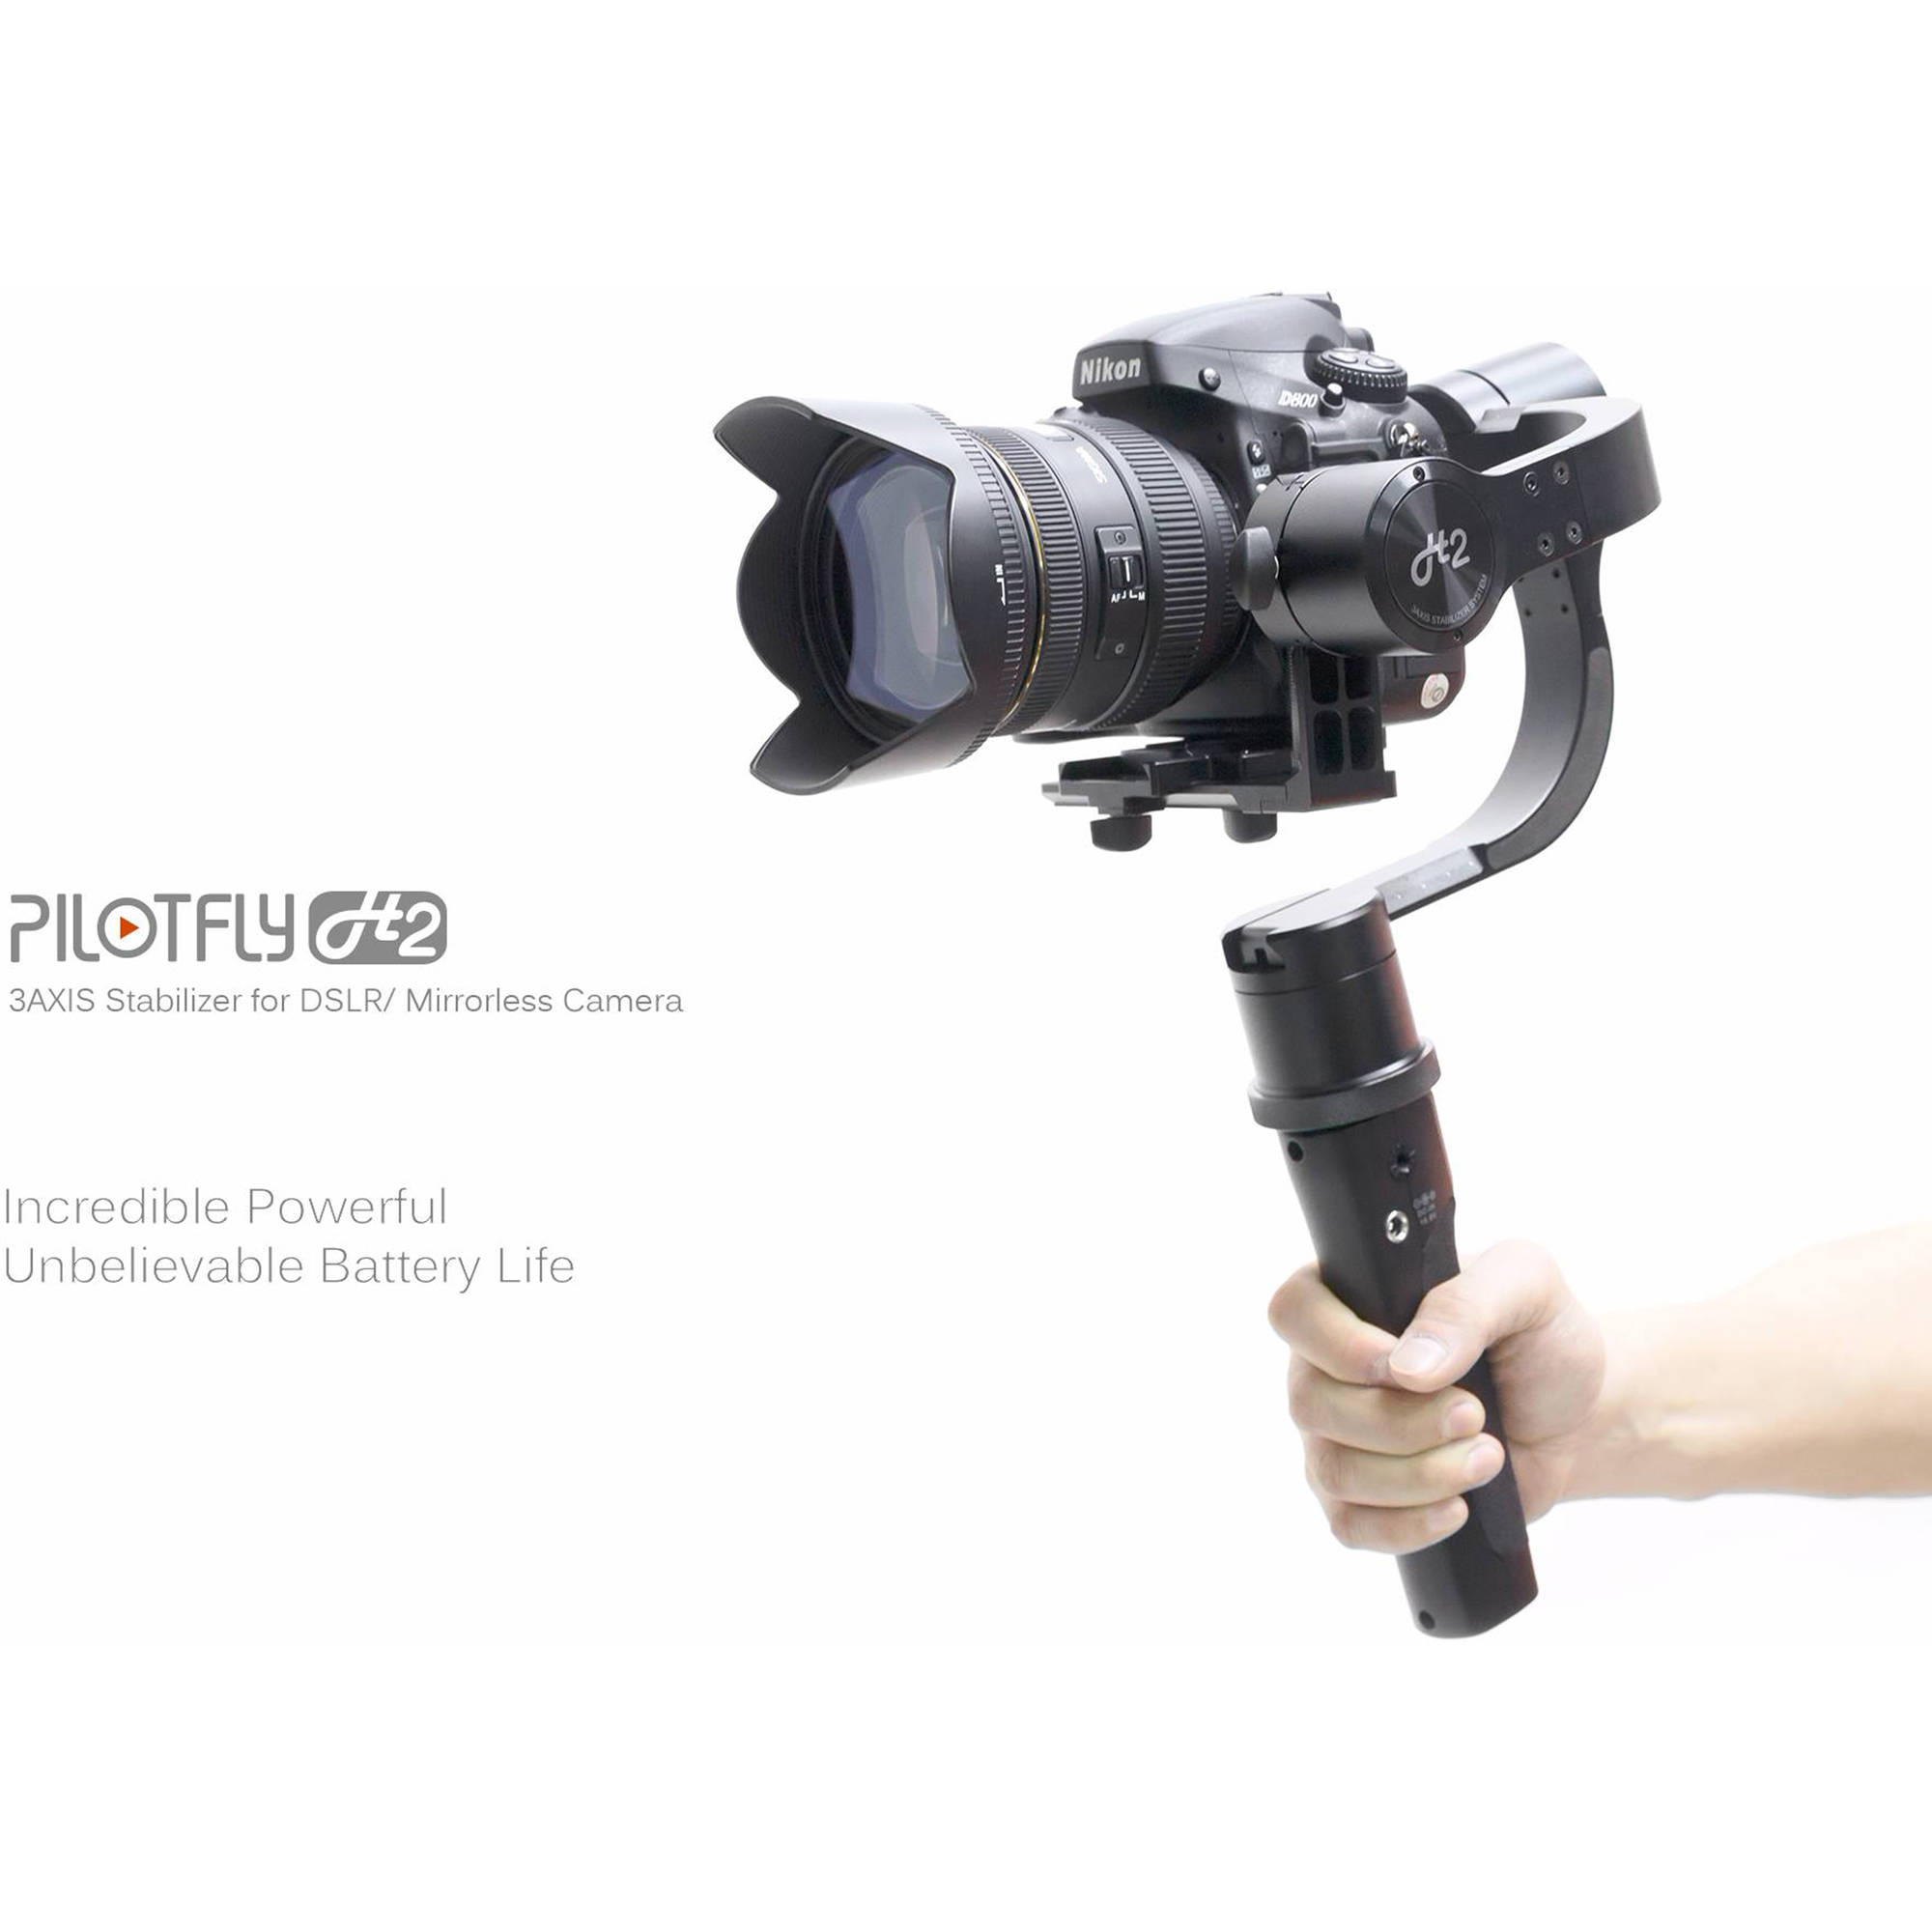 Pilotfly H2 3-Axis Handheld Gimbal Stabilizer